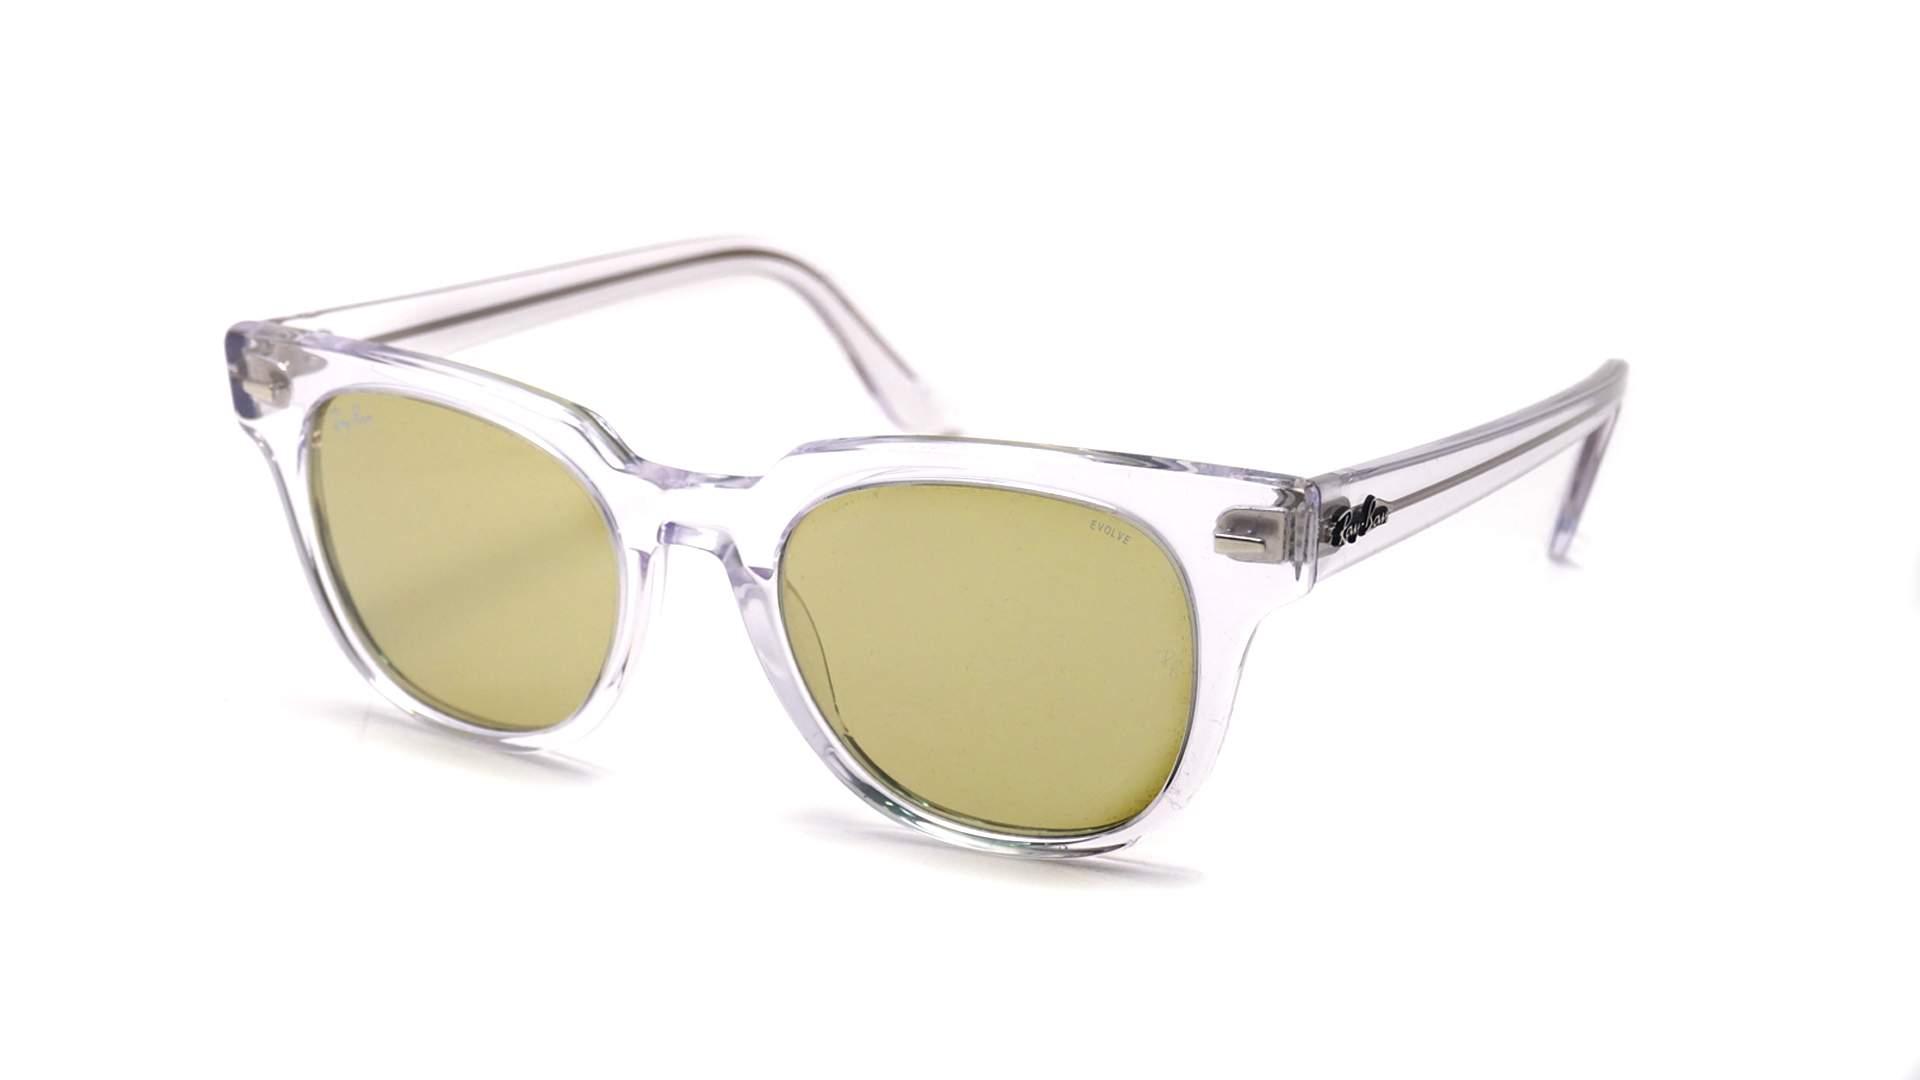 23ae05694a Sunglasses Ray-Ban Meteor Clear Evolve RB2168 912 4C 50-20 Medium  Photochromic